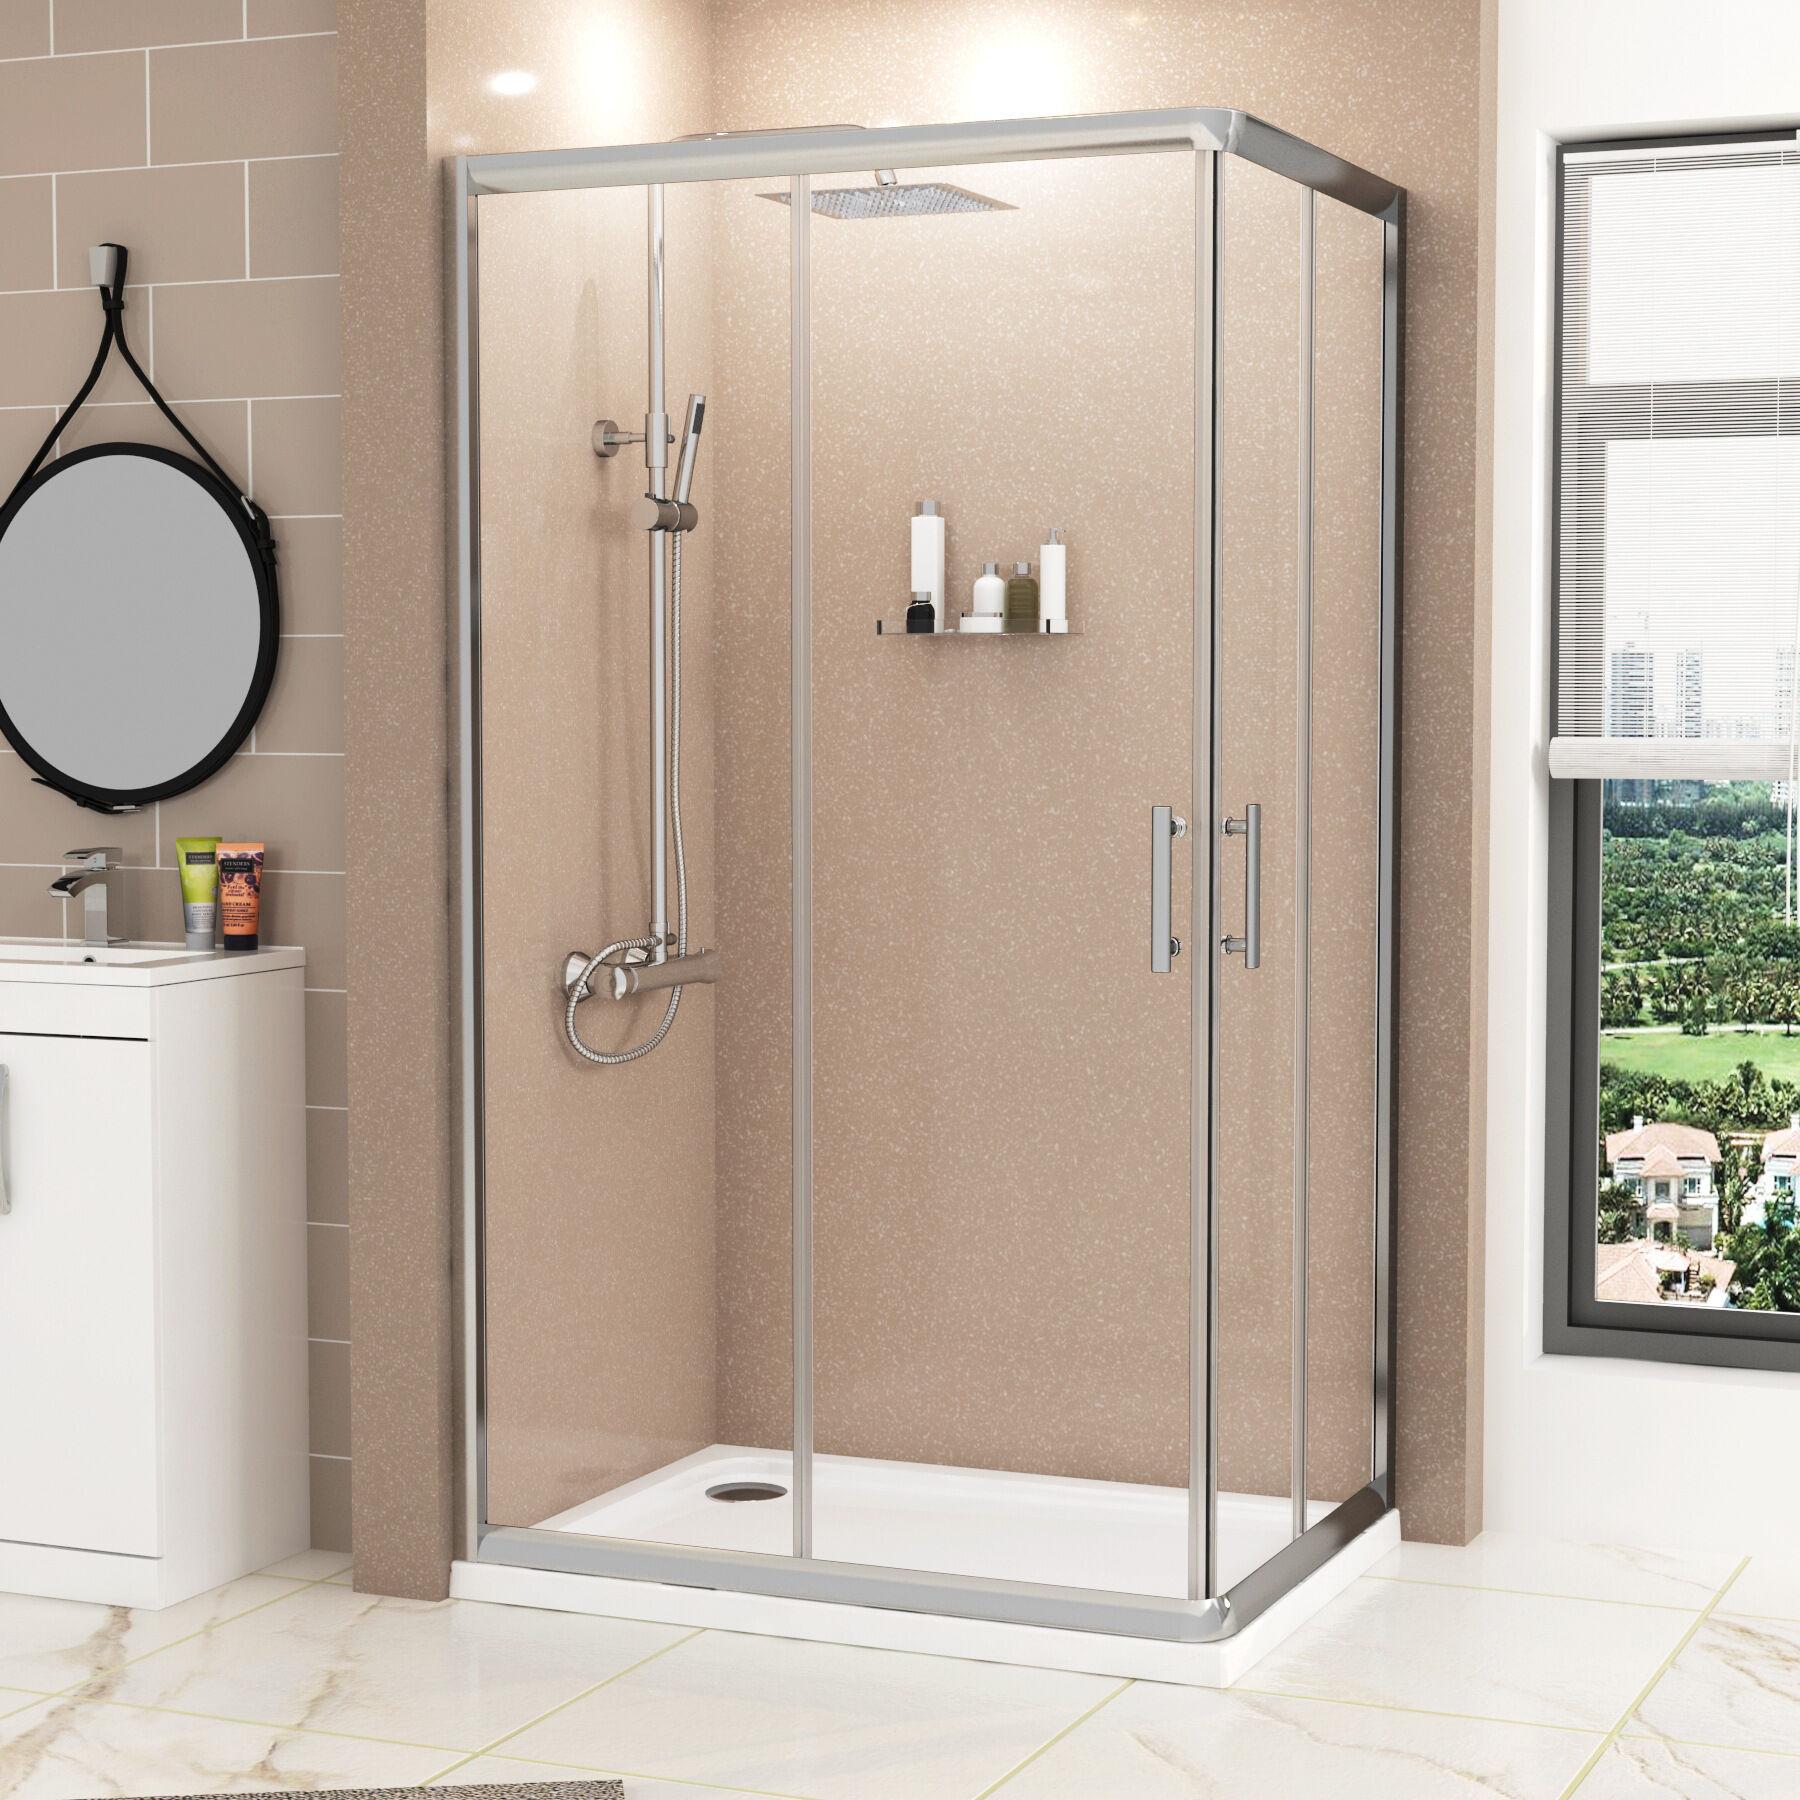 Royal Bathrooms Plaza 1000 x 900mm Rectangular Corner Entry Shower Enclosure - Sliding Door